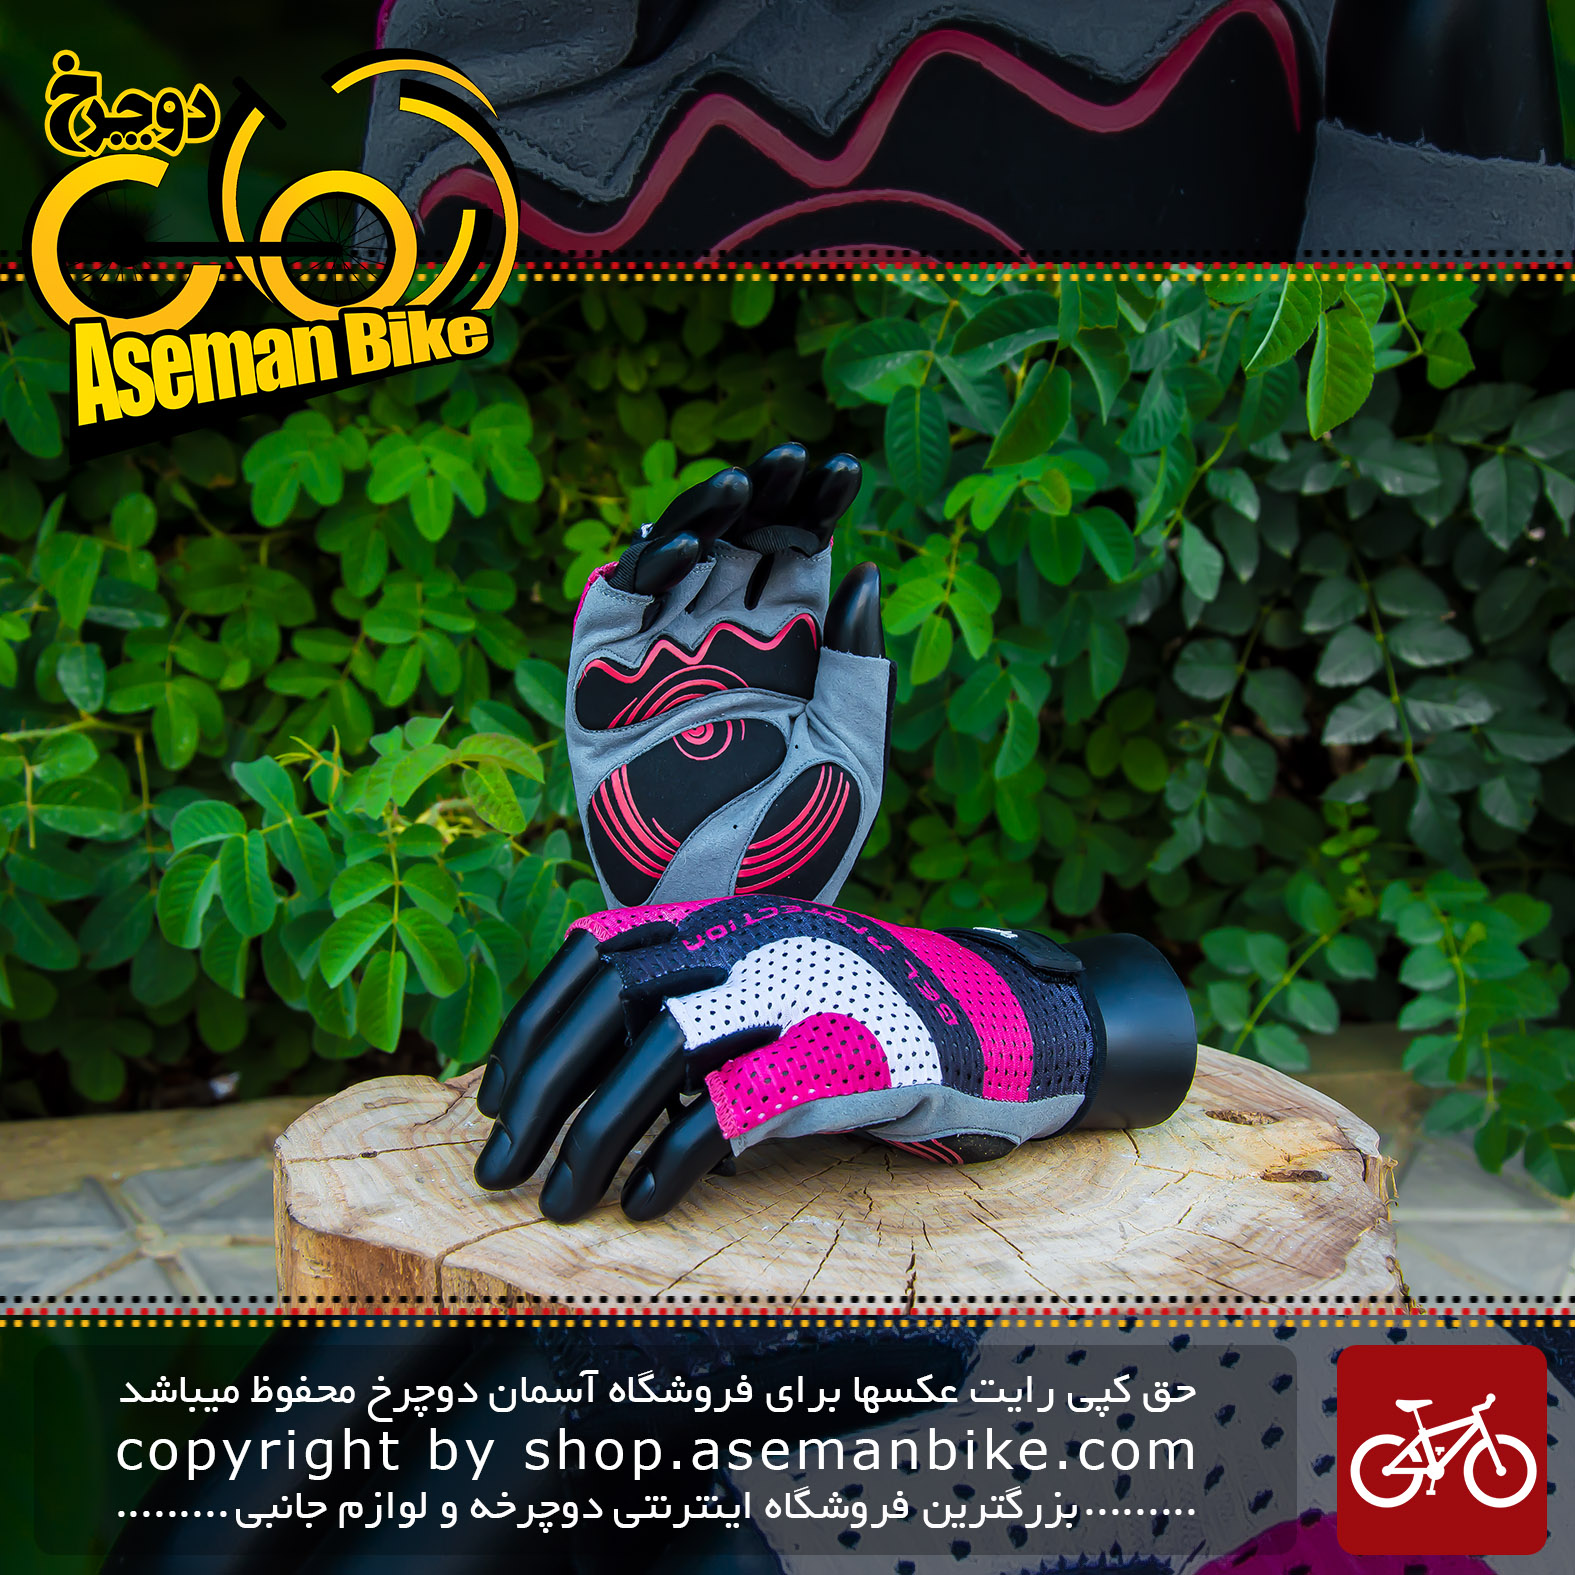 دستکش دوچرخه سواری دینامیک صورتی مشکی Dynamic Gloves